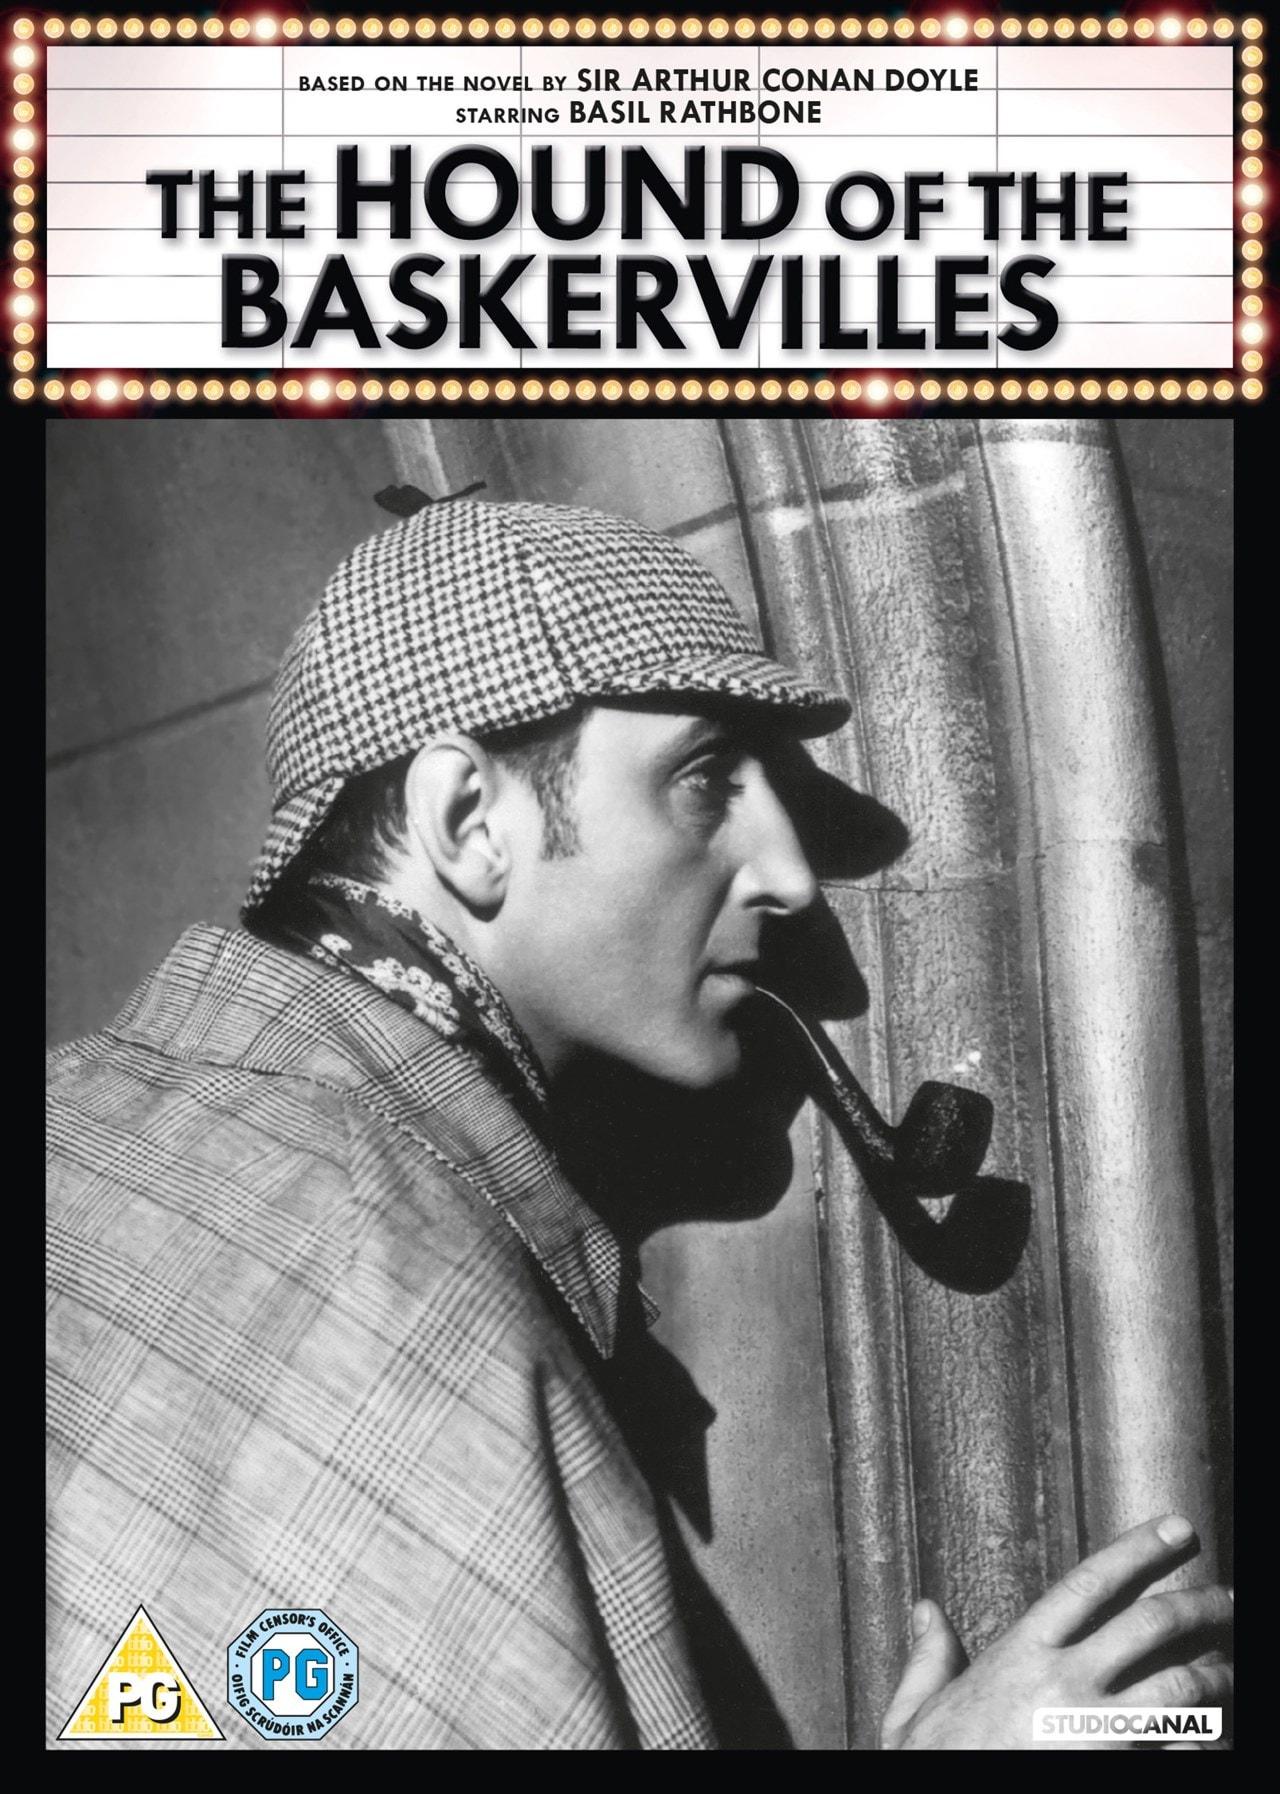 The Hound of the Baskervilles - British Classics (hmv Exclusive) - 1